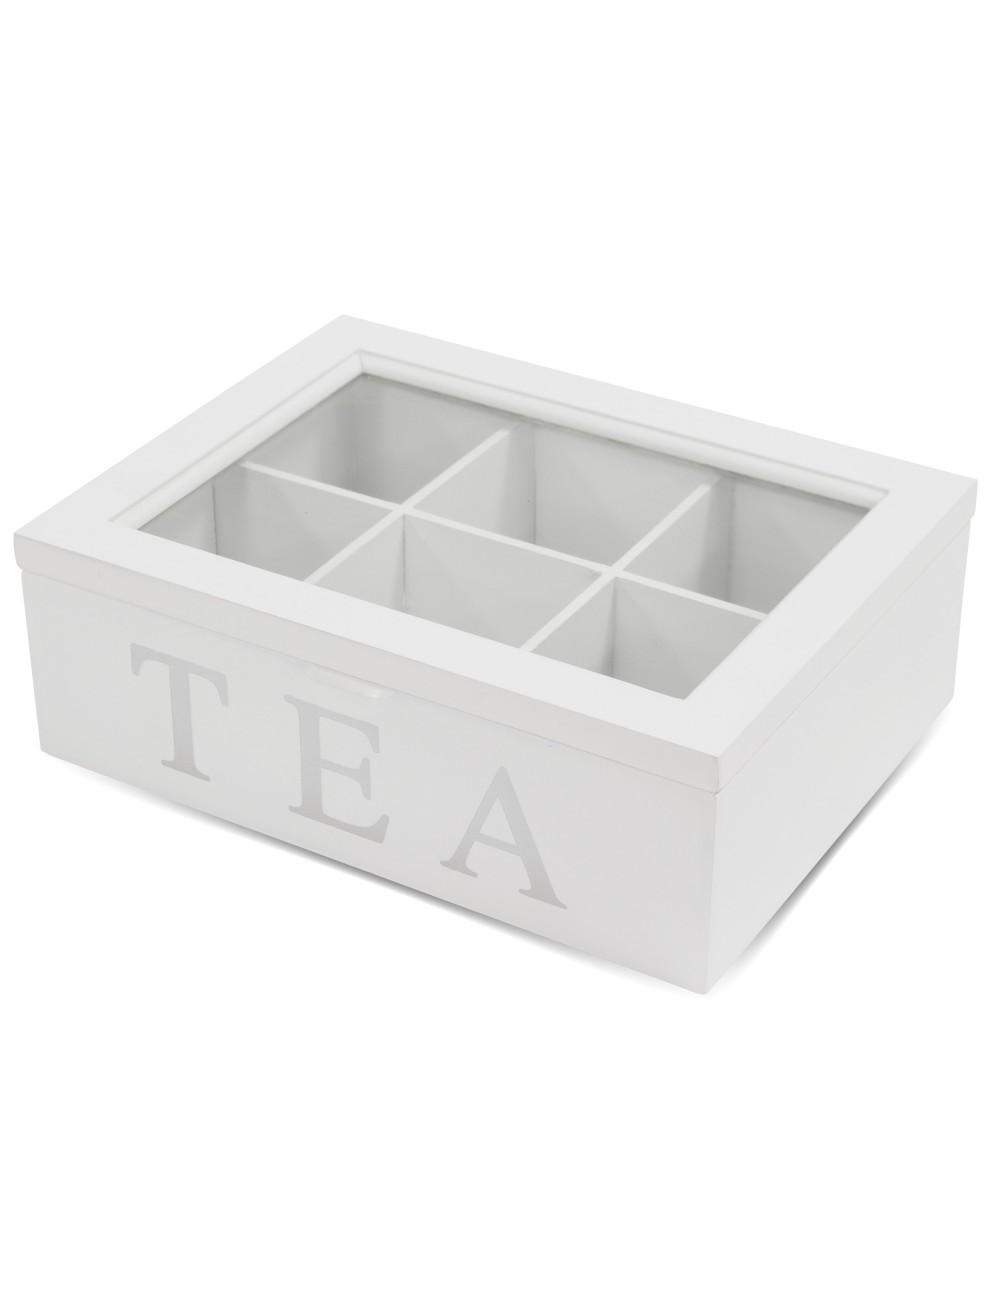 biała skrzynka na herbatę TEA 6 przegródek